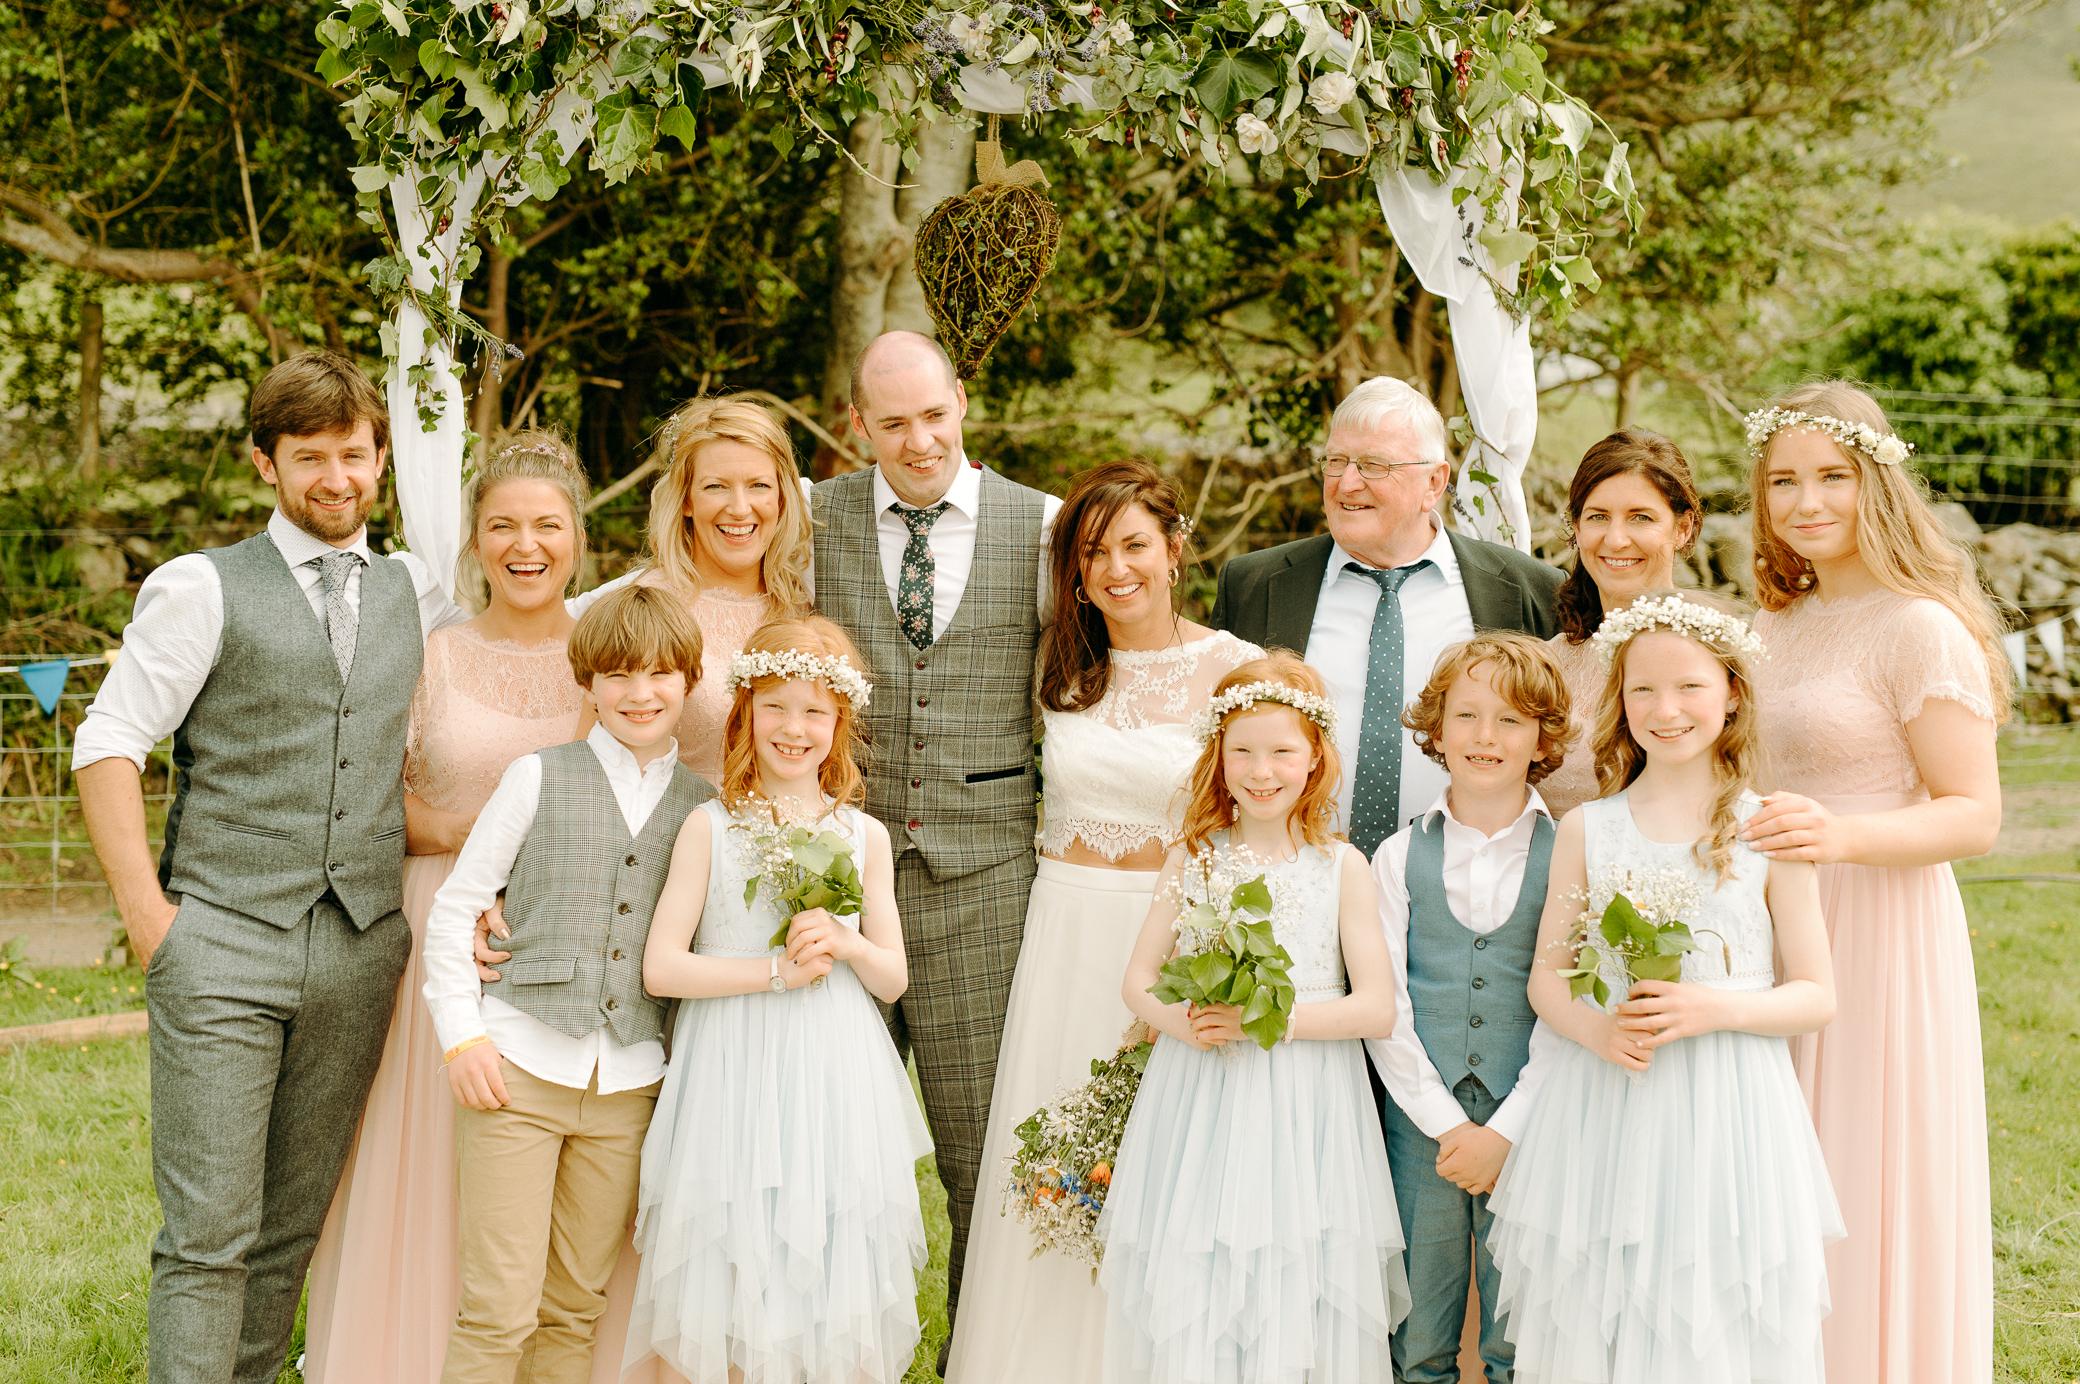 Carmel&Marcus_Wedding photographer Europe-75.jpg